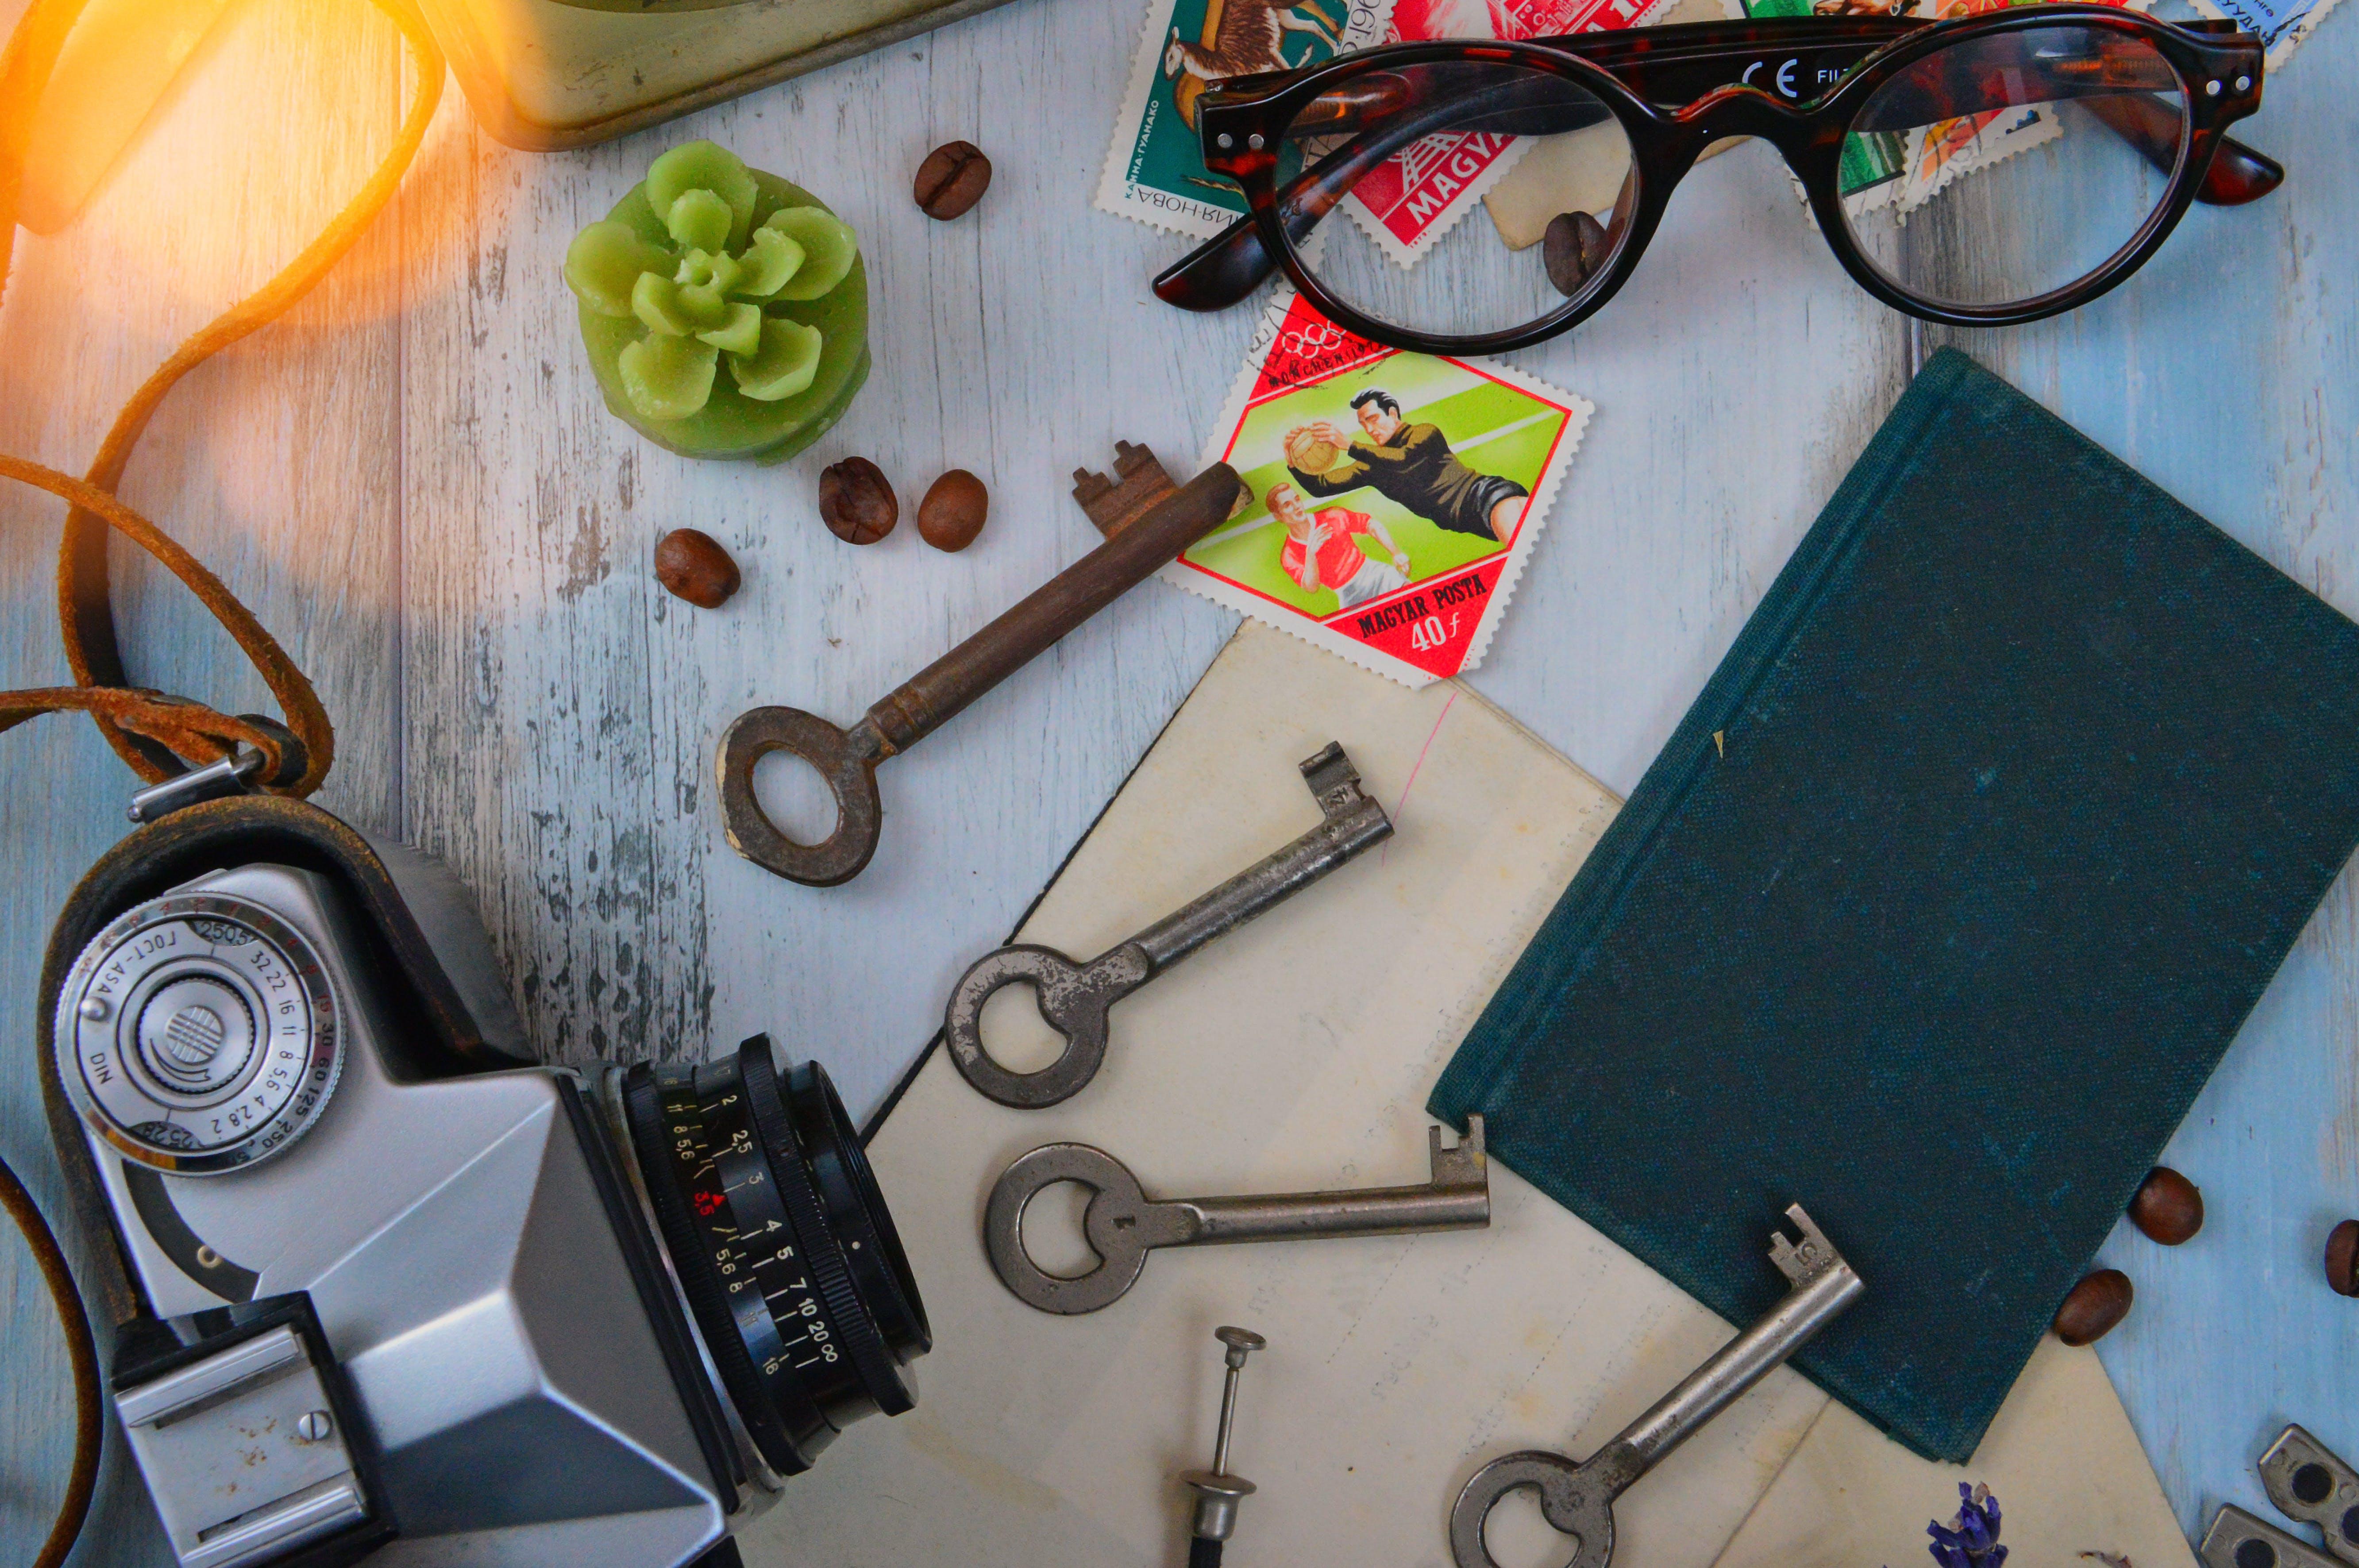 Four Gray Skeleton Keys Next to Gray Camera, Black Book, and Brown Framed Eyeglasses